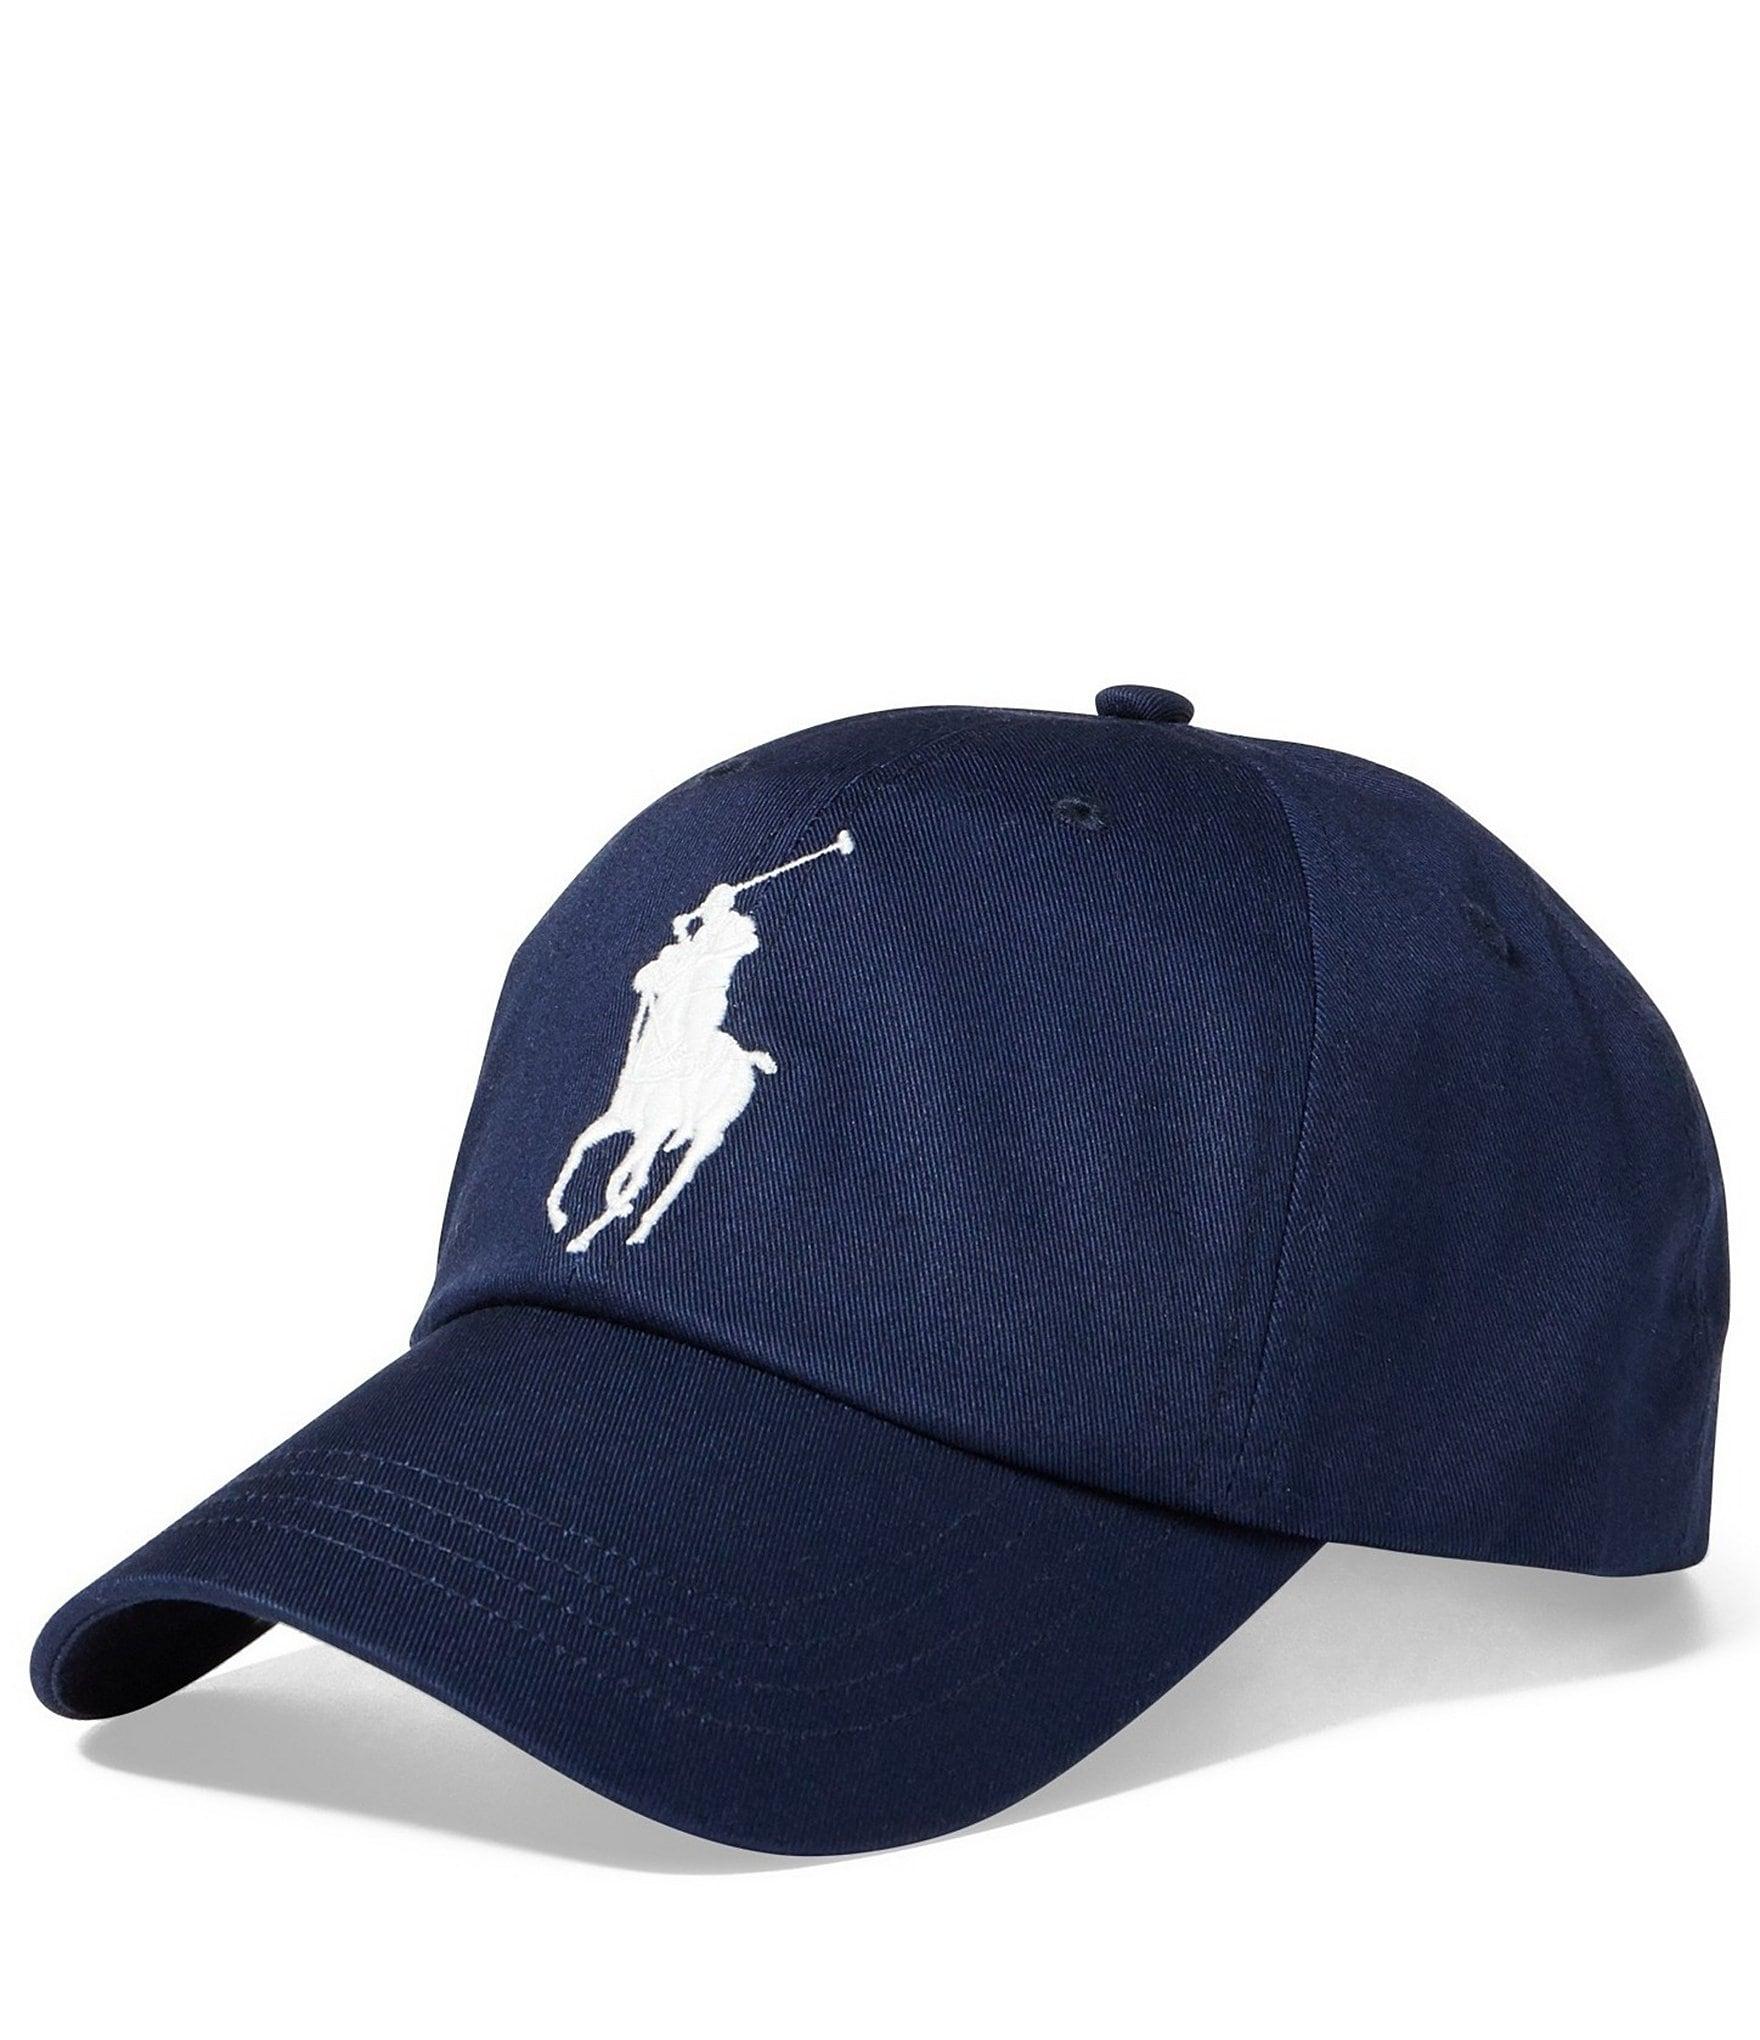 dcf6343b1dd Polo Ralph Lauren Big Pony Athletic Twill Cap | Dillard's